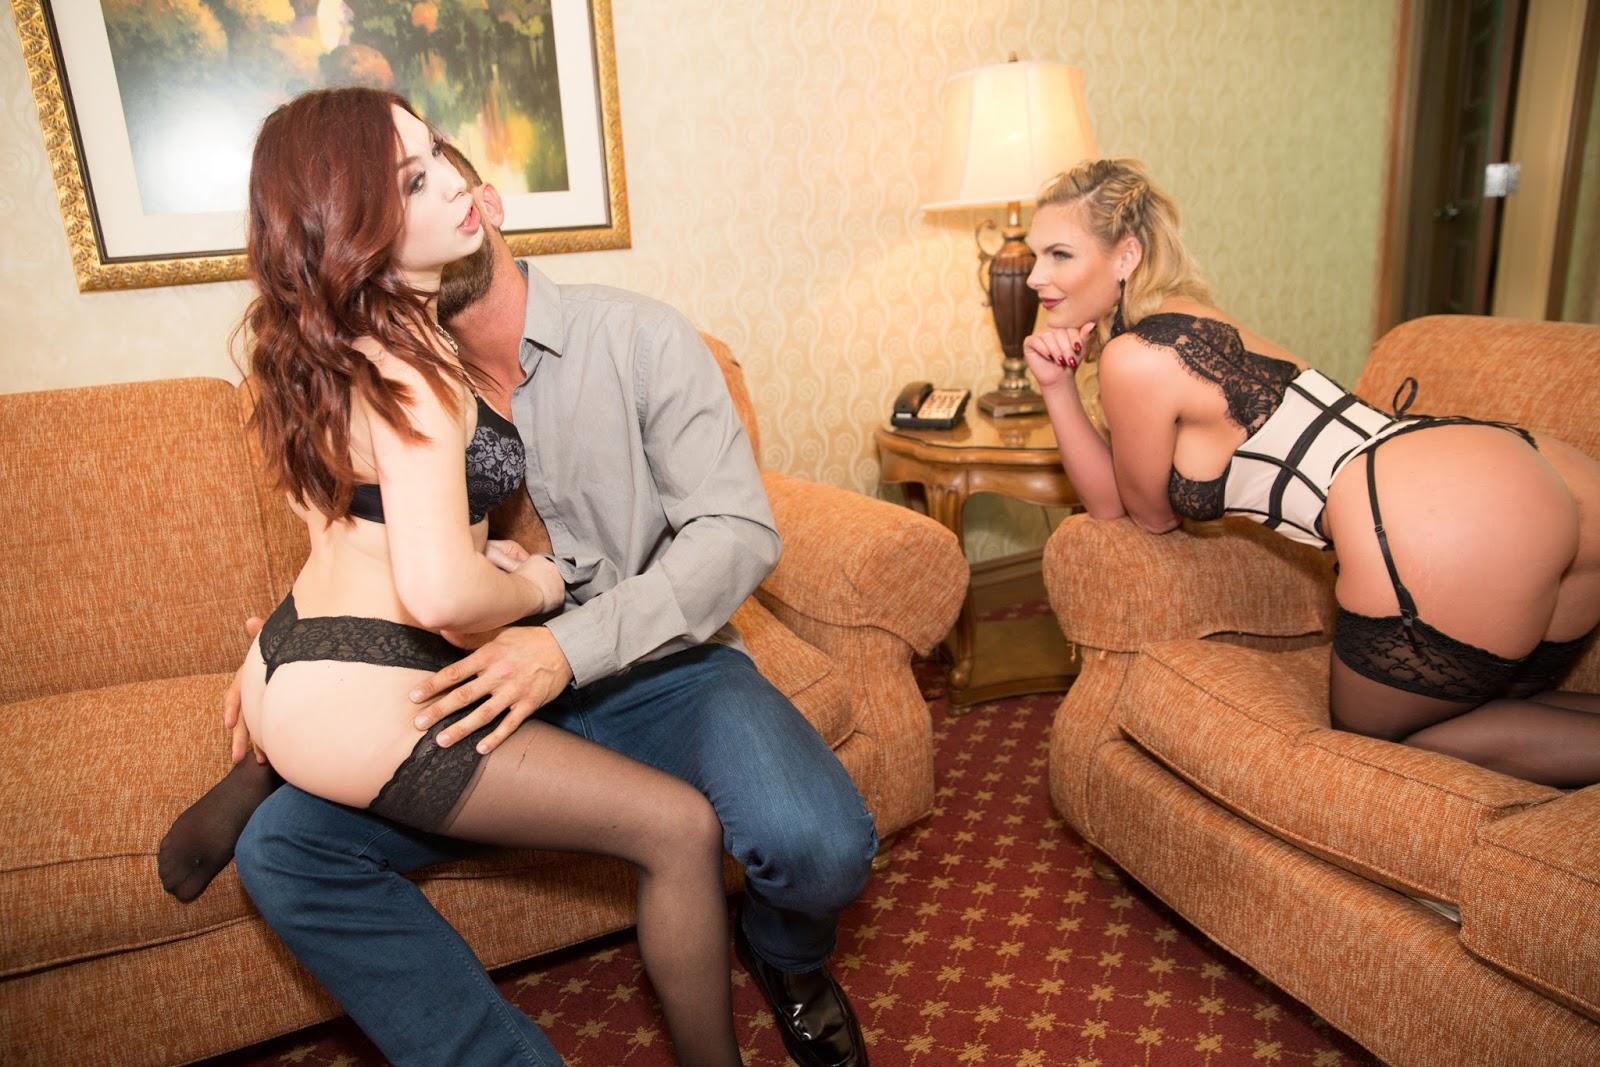 Phoenix marie threesome videos-5024